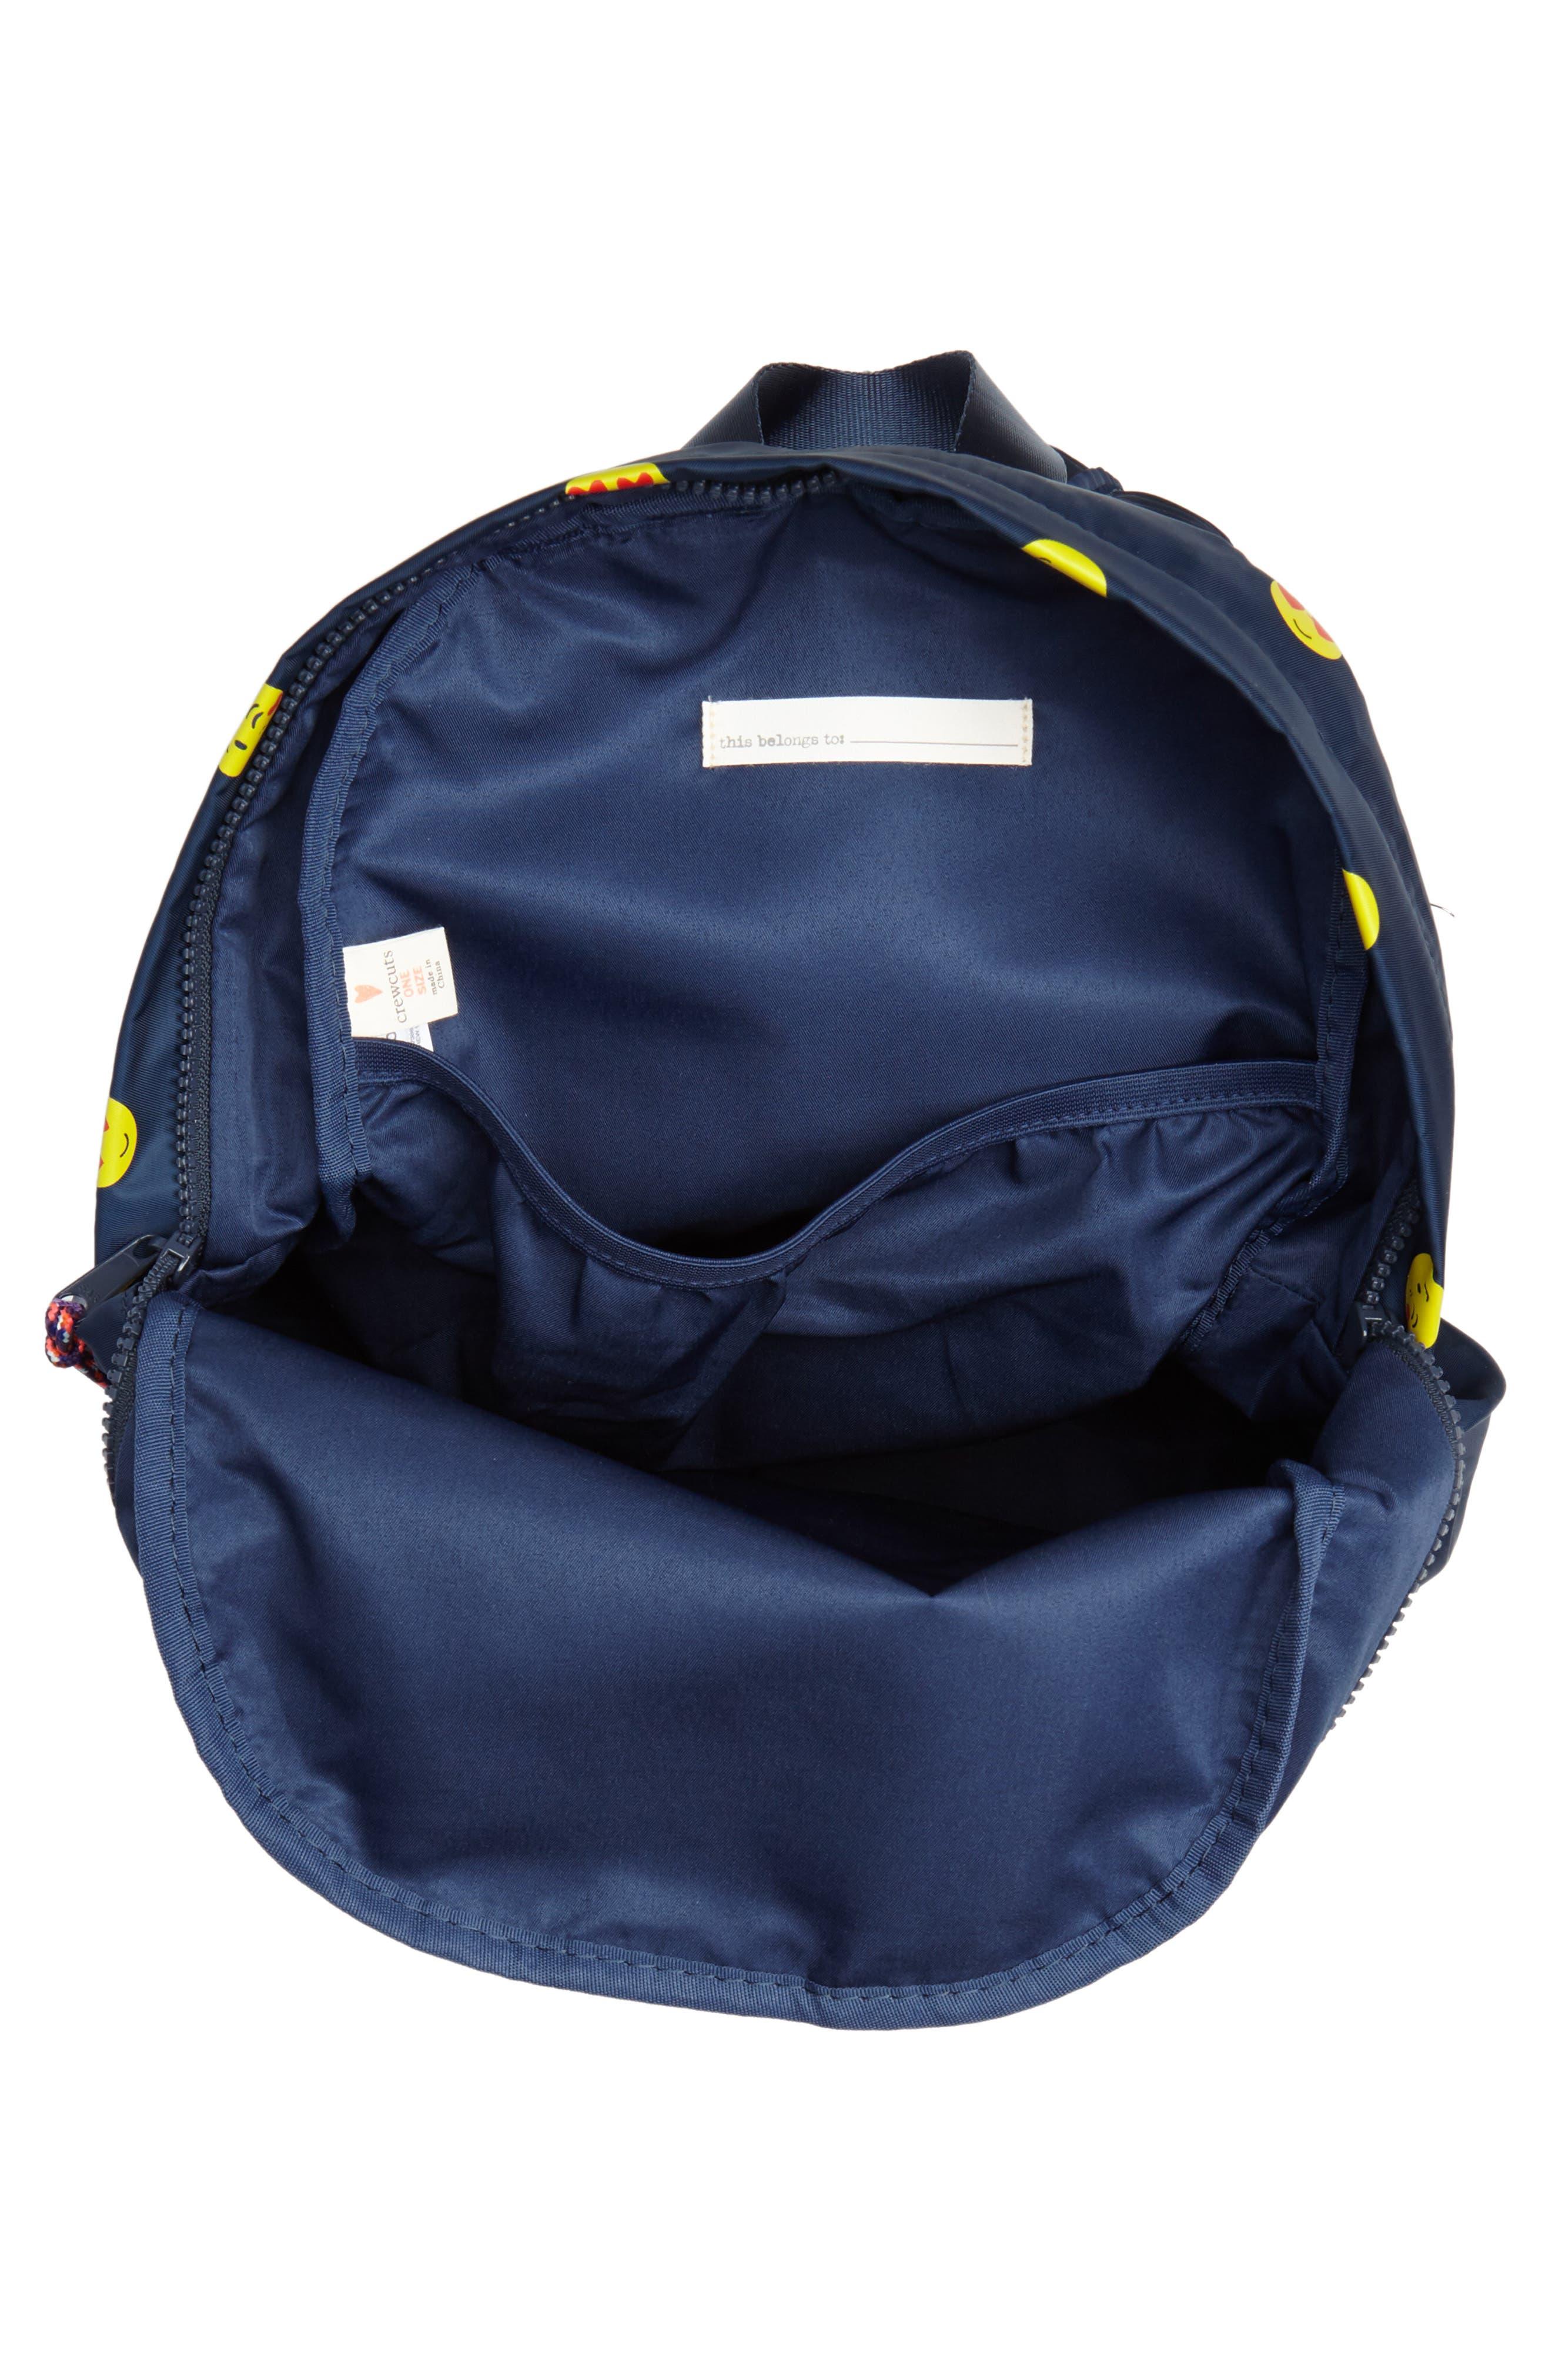 Emoji Backpack,                             Alternate thumbnail 3, color,                             NAVY